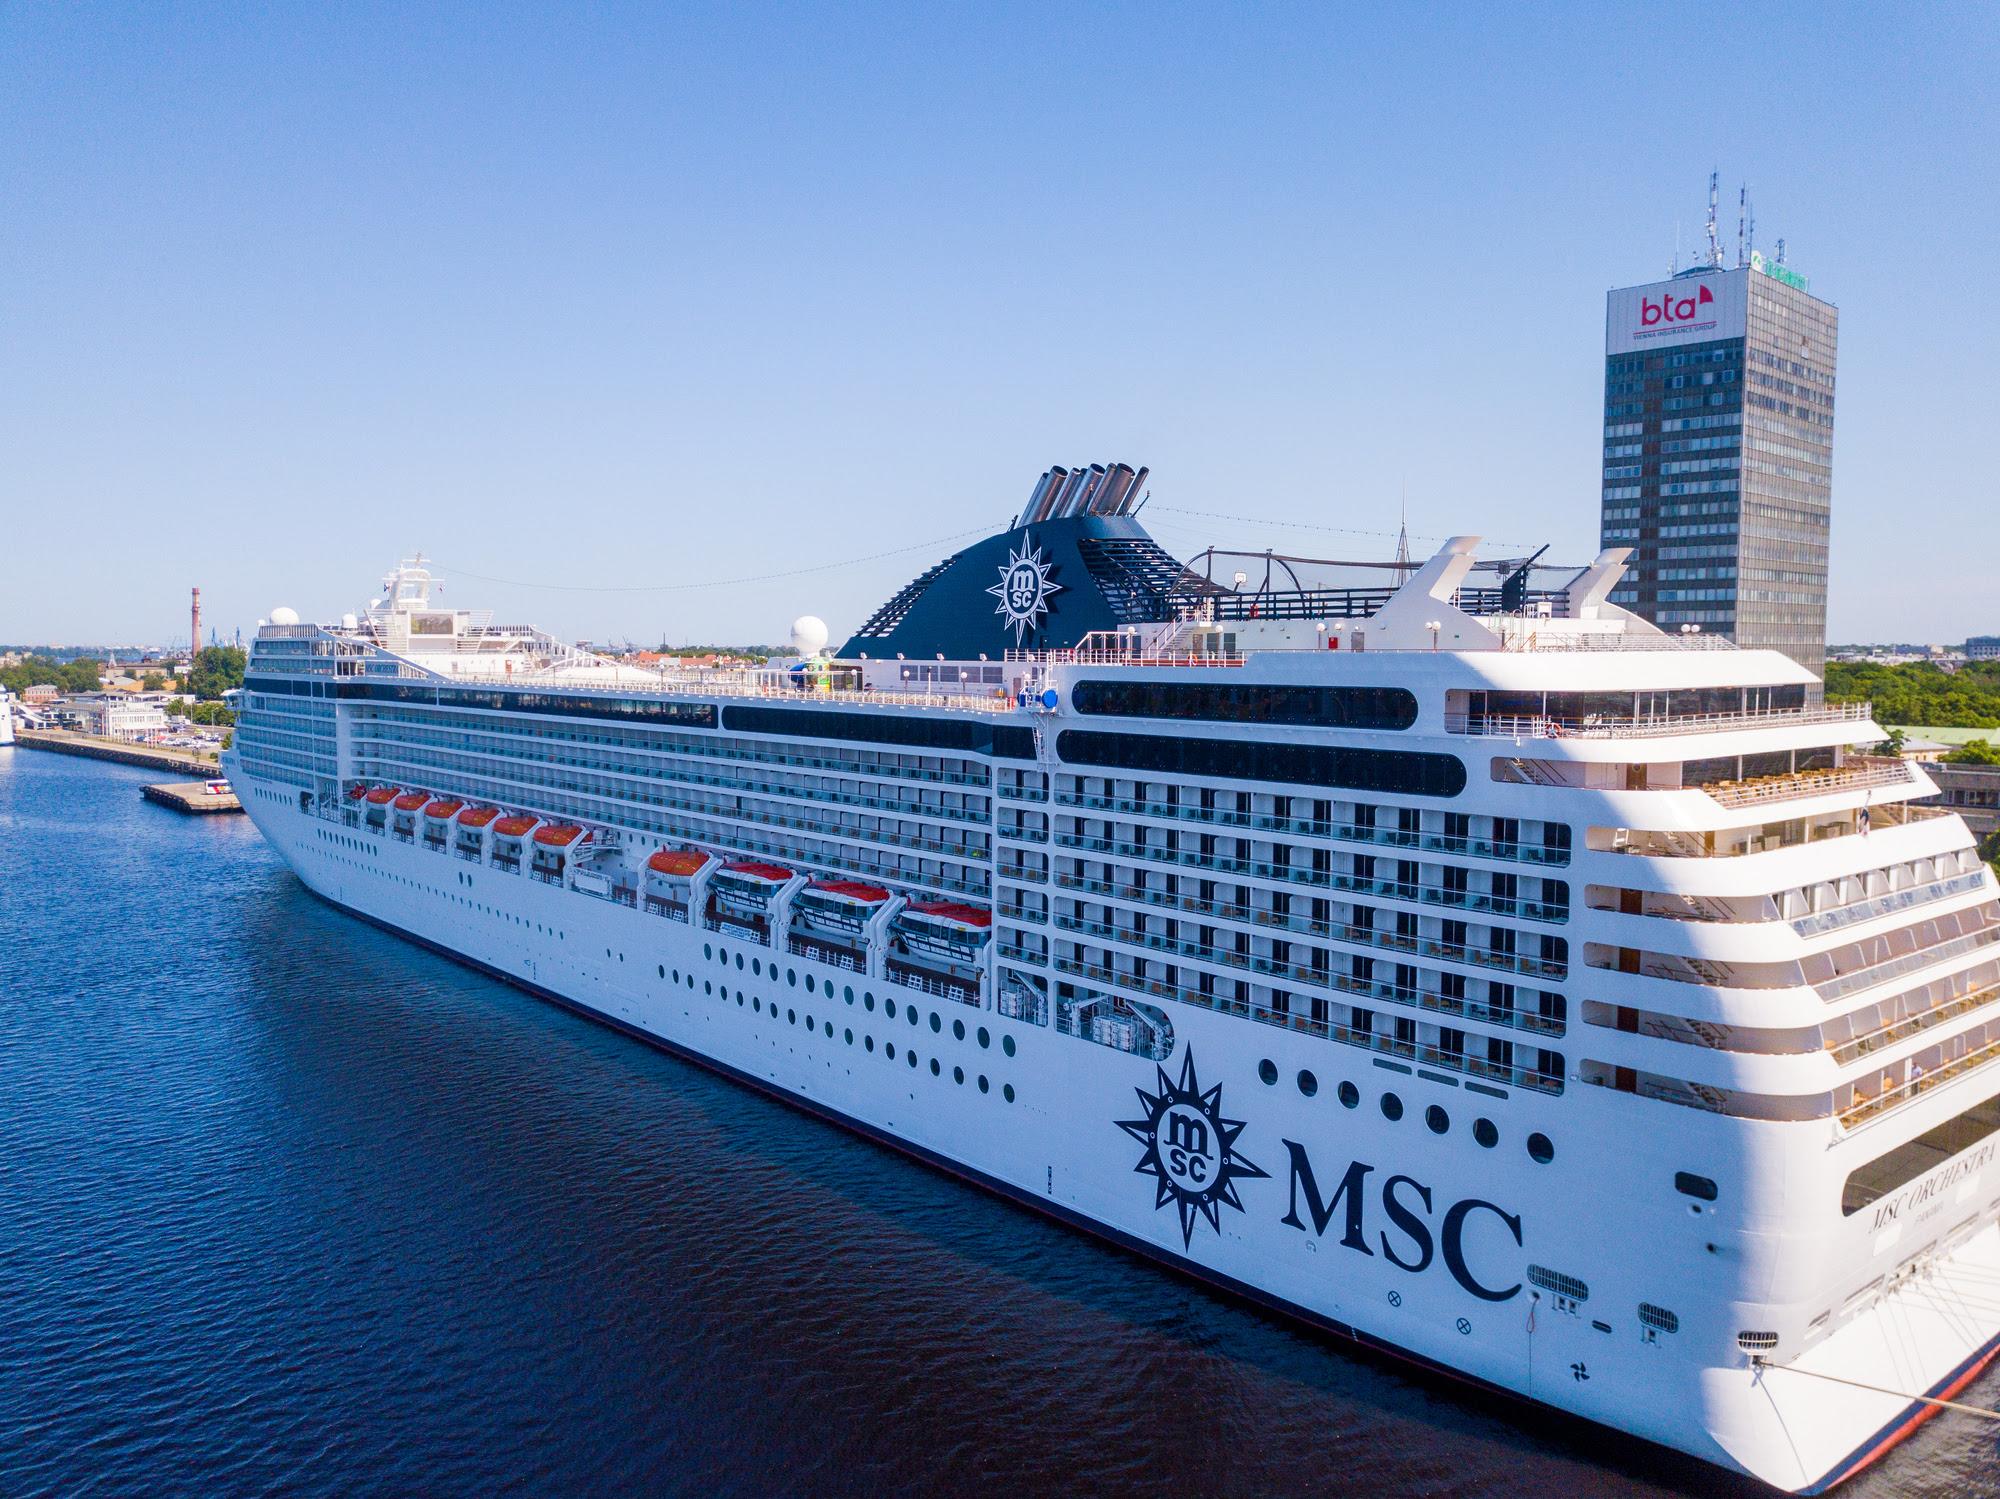 Los Dejores cruceros MSC  Royal Holiday Vacation Club Cruises